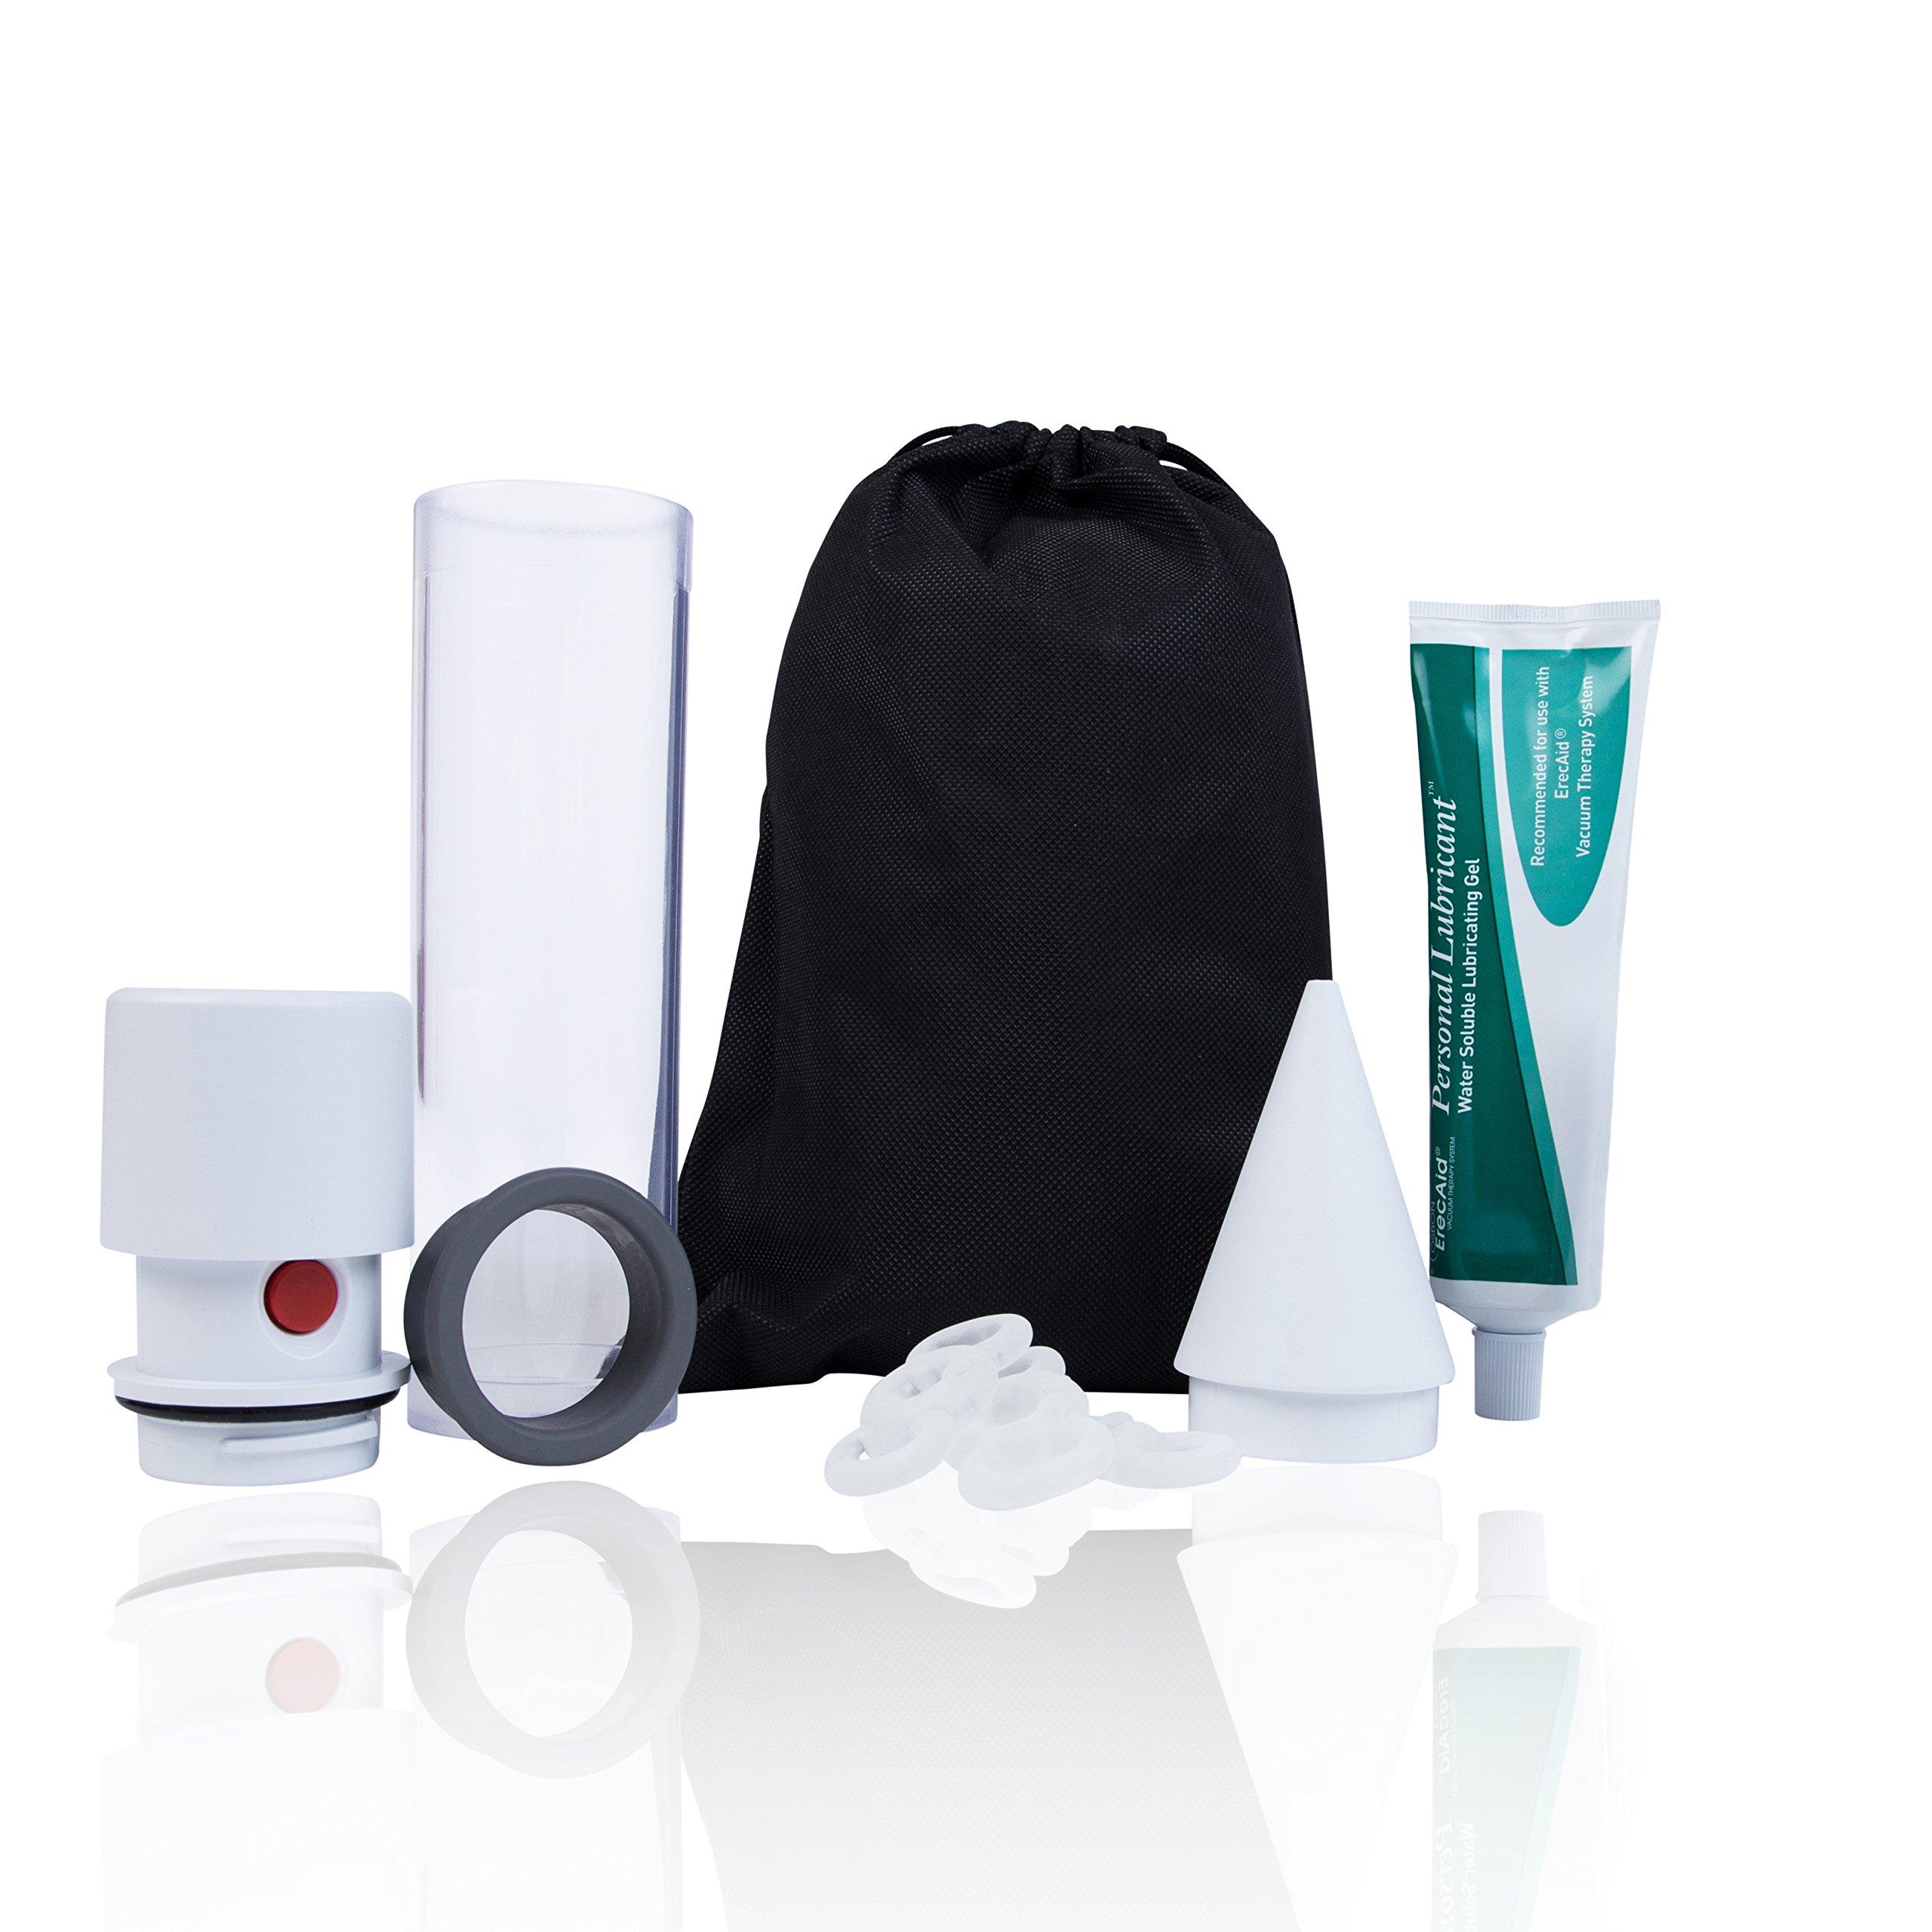 Vacuum Pump for Men, Natural Alternative to Erectile Dysfunction Pills, Manual Penis Pump, Men's Pump Kit for Erectile Dysfunction - Pos-T-Vac, Easy Pro 1000 by POS-T-VAC (Image #1)